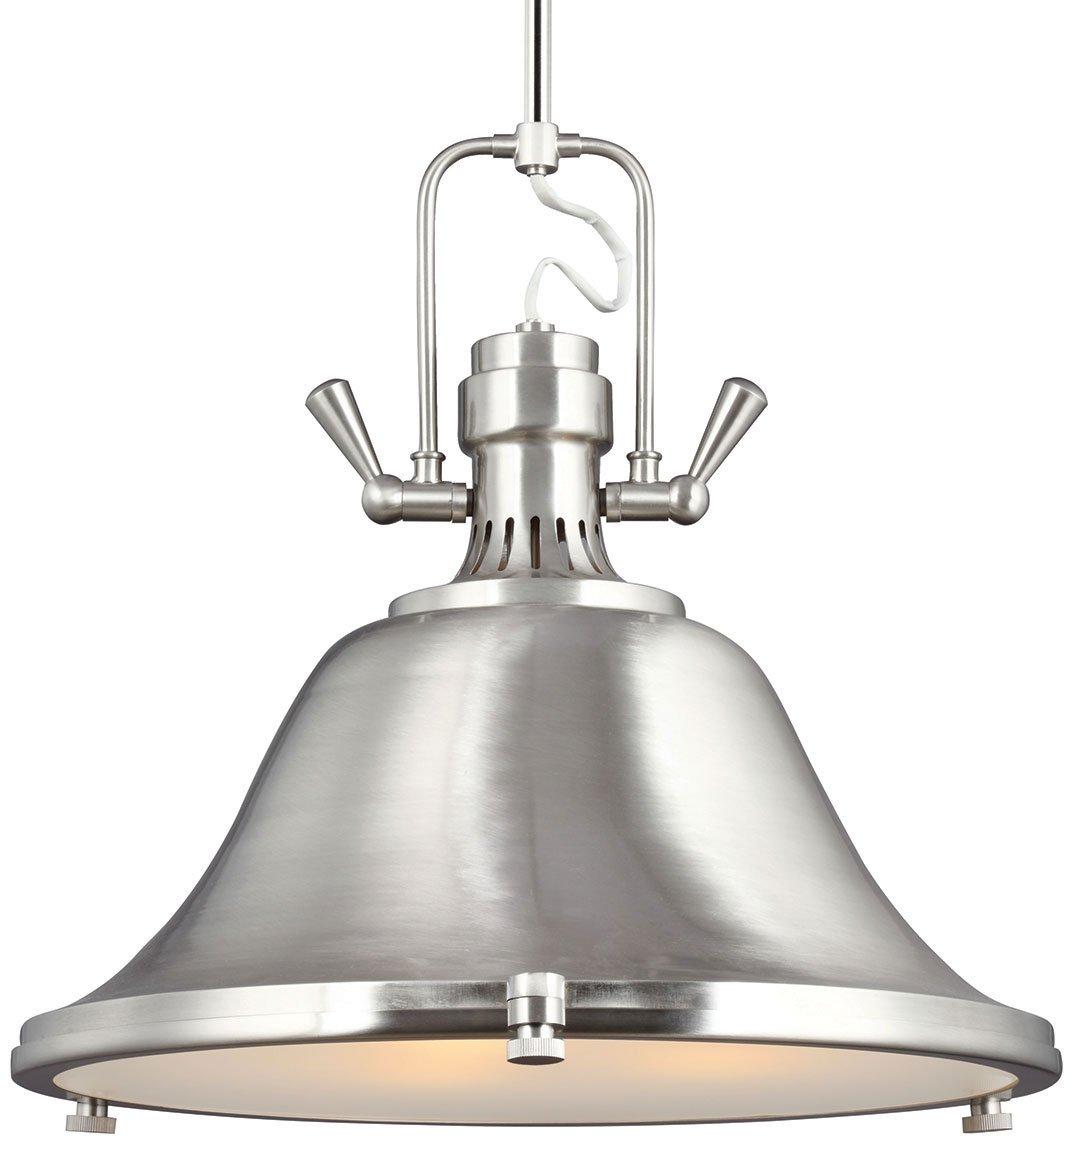 Sea Gull Lighting 6514403BLE 962 Stone Street 13W CFL Modern Contemporary P